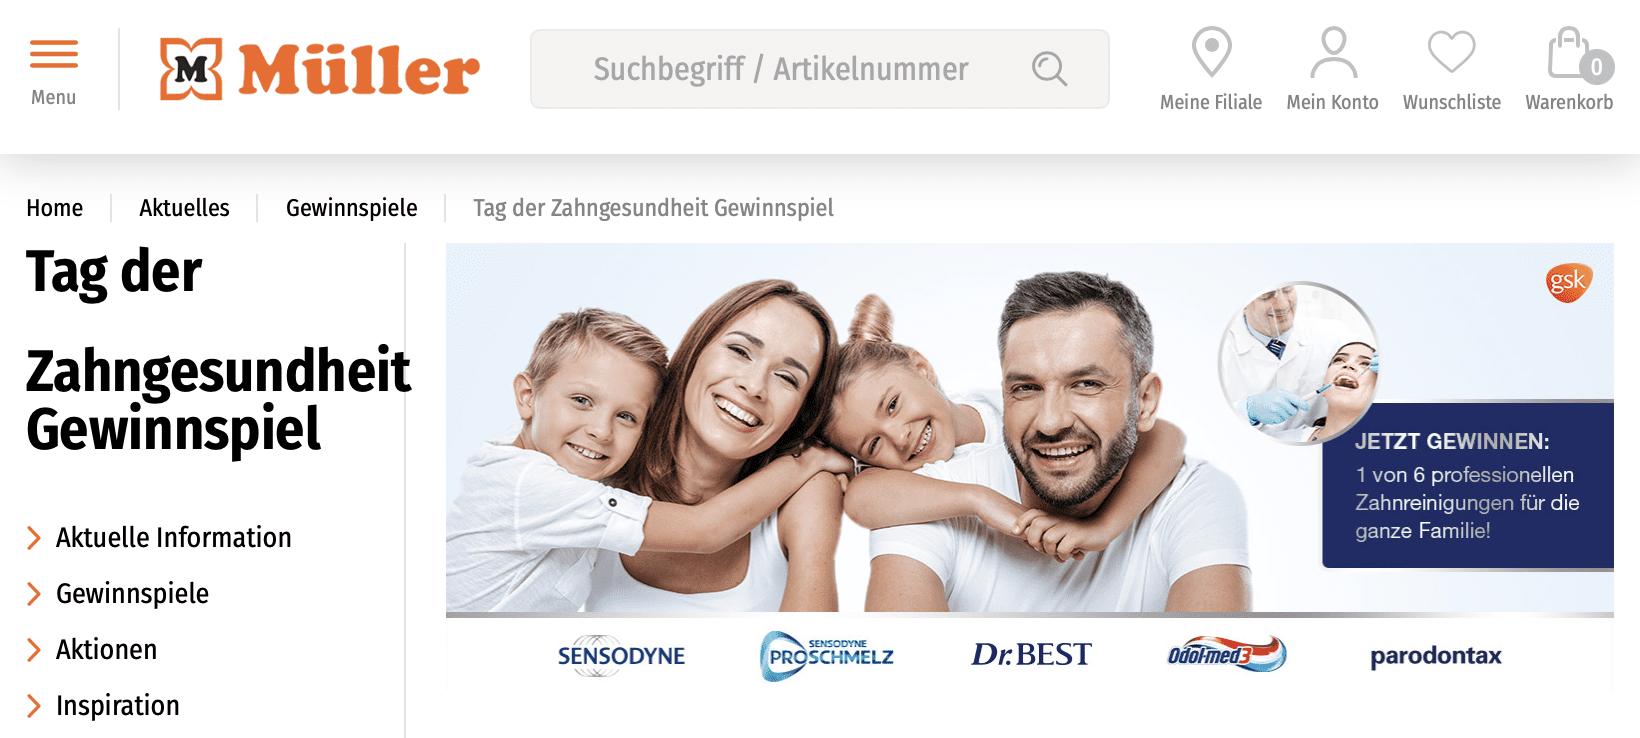 Gewinnspiel-Cases Drogeriemärkte Müller Gewinnspiel